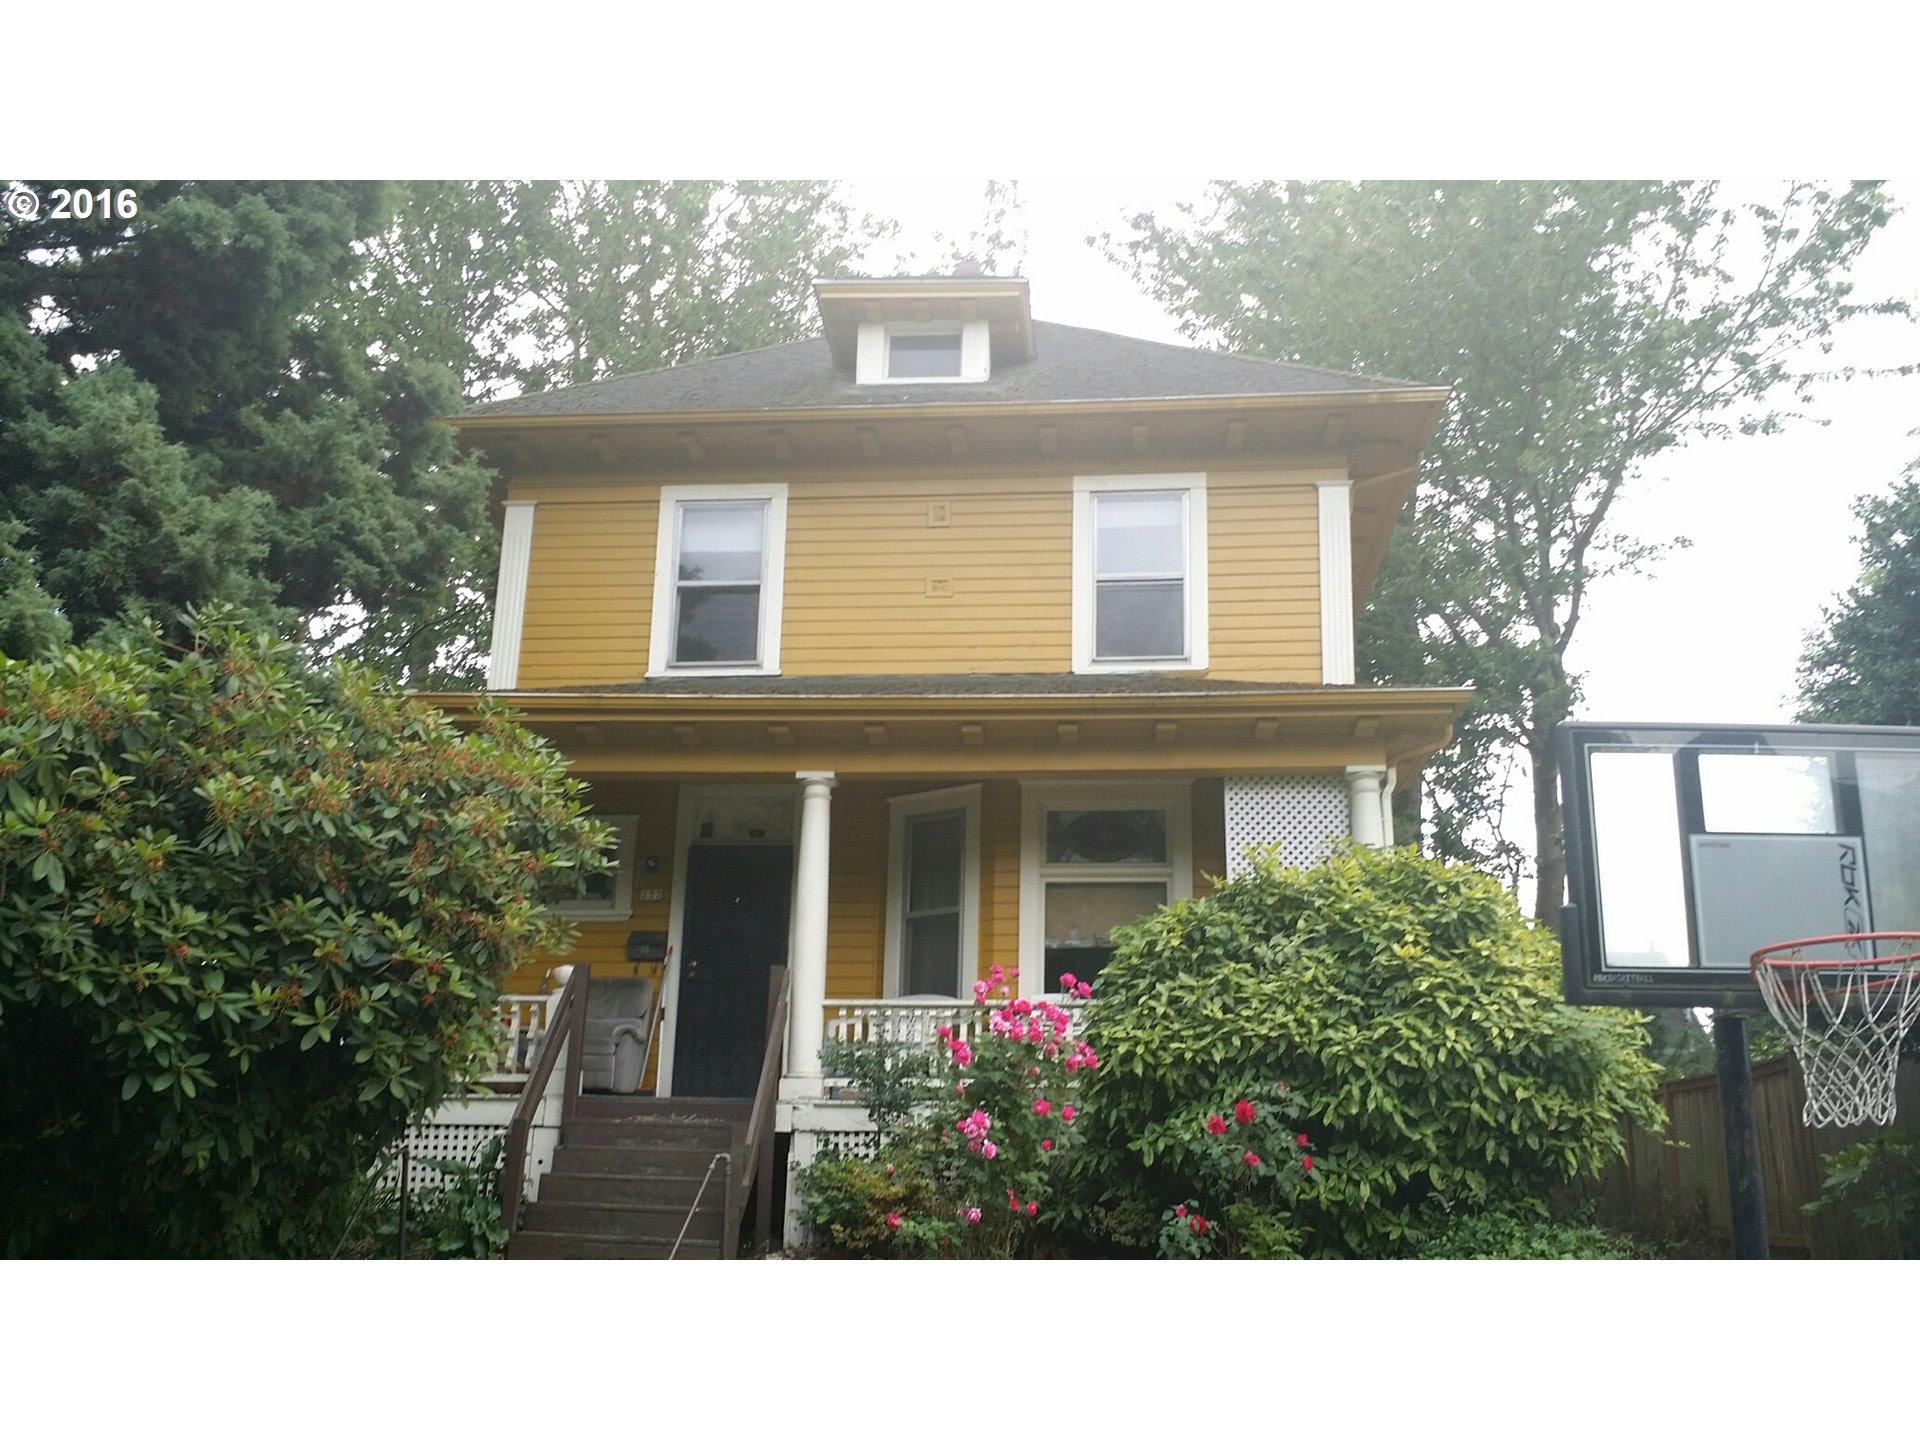 $350,000 - 3Br/1Ba -  for Sale in Boise Eliot, Portland